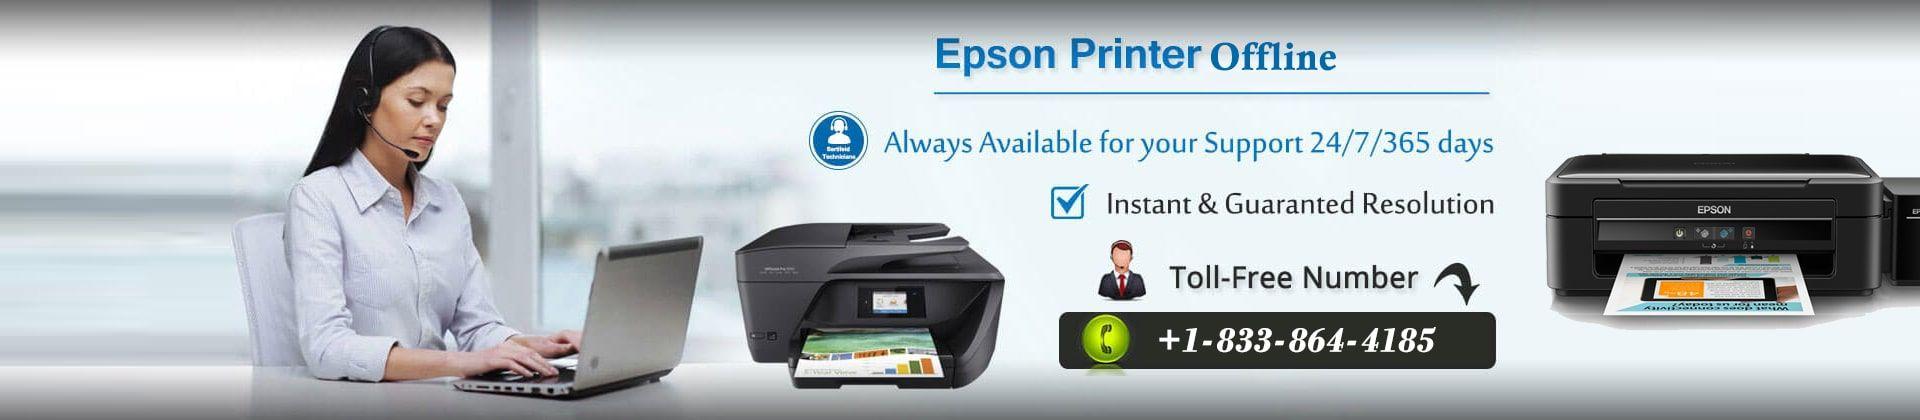 Epson Printer Offline |+1 833 864 4185 | Epson Printer Tech Support